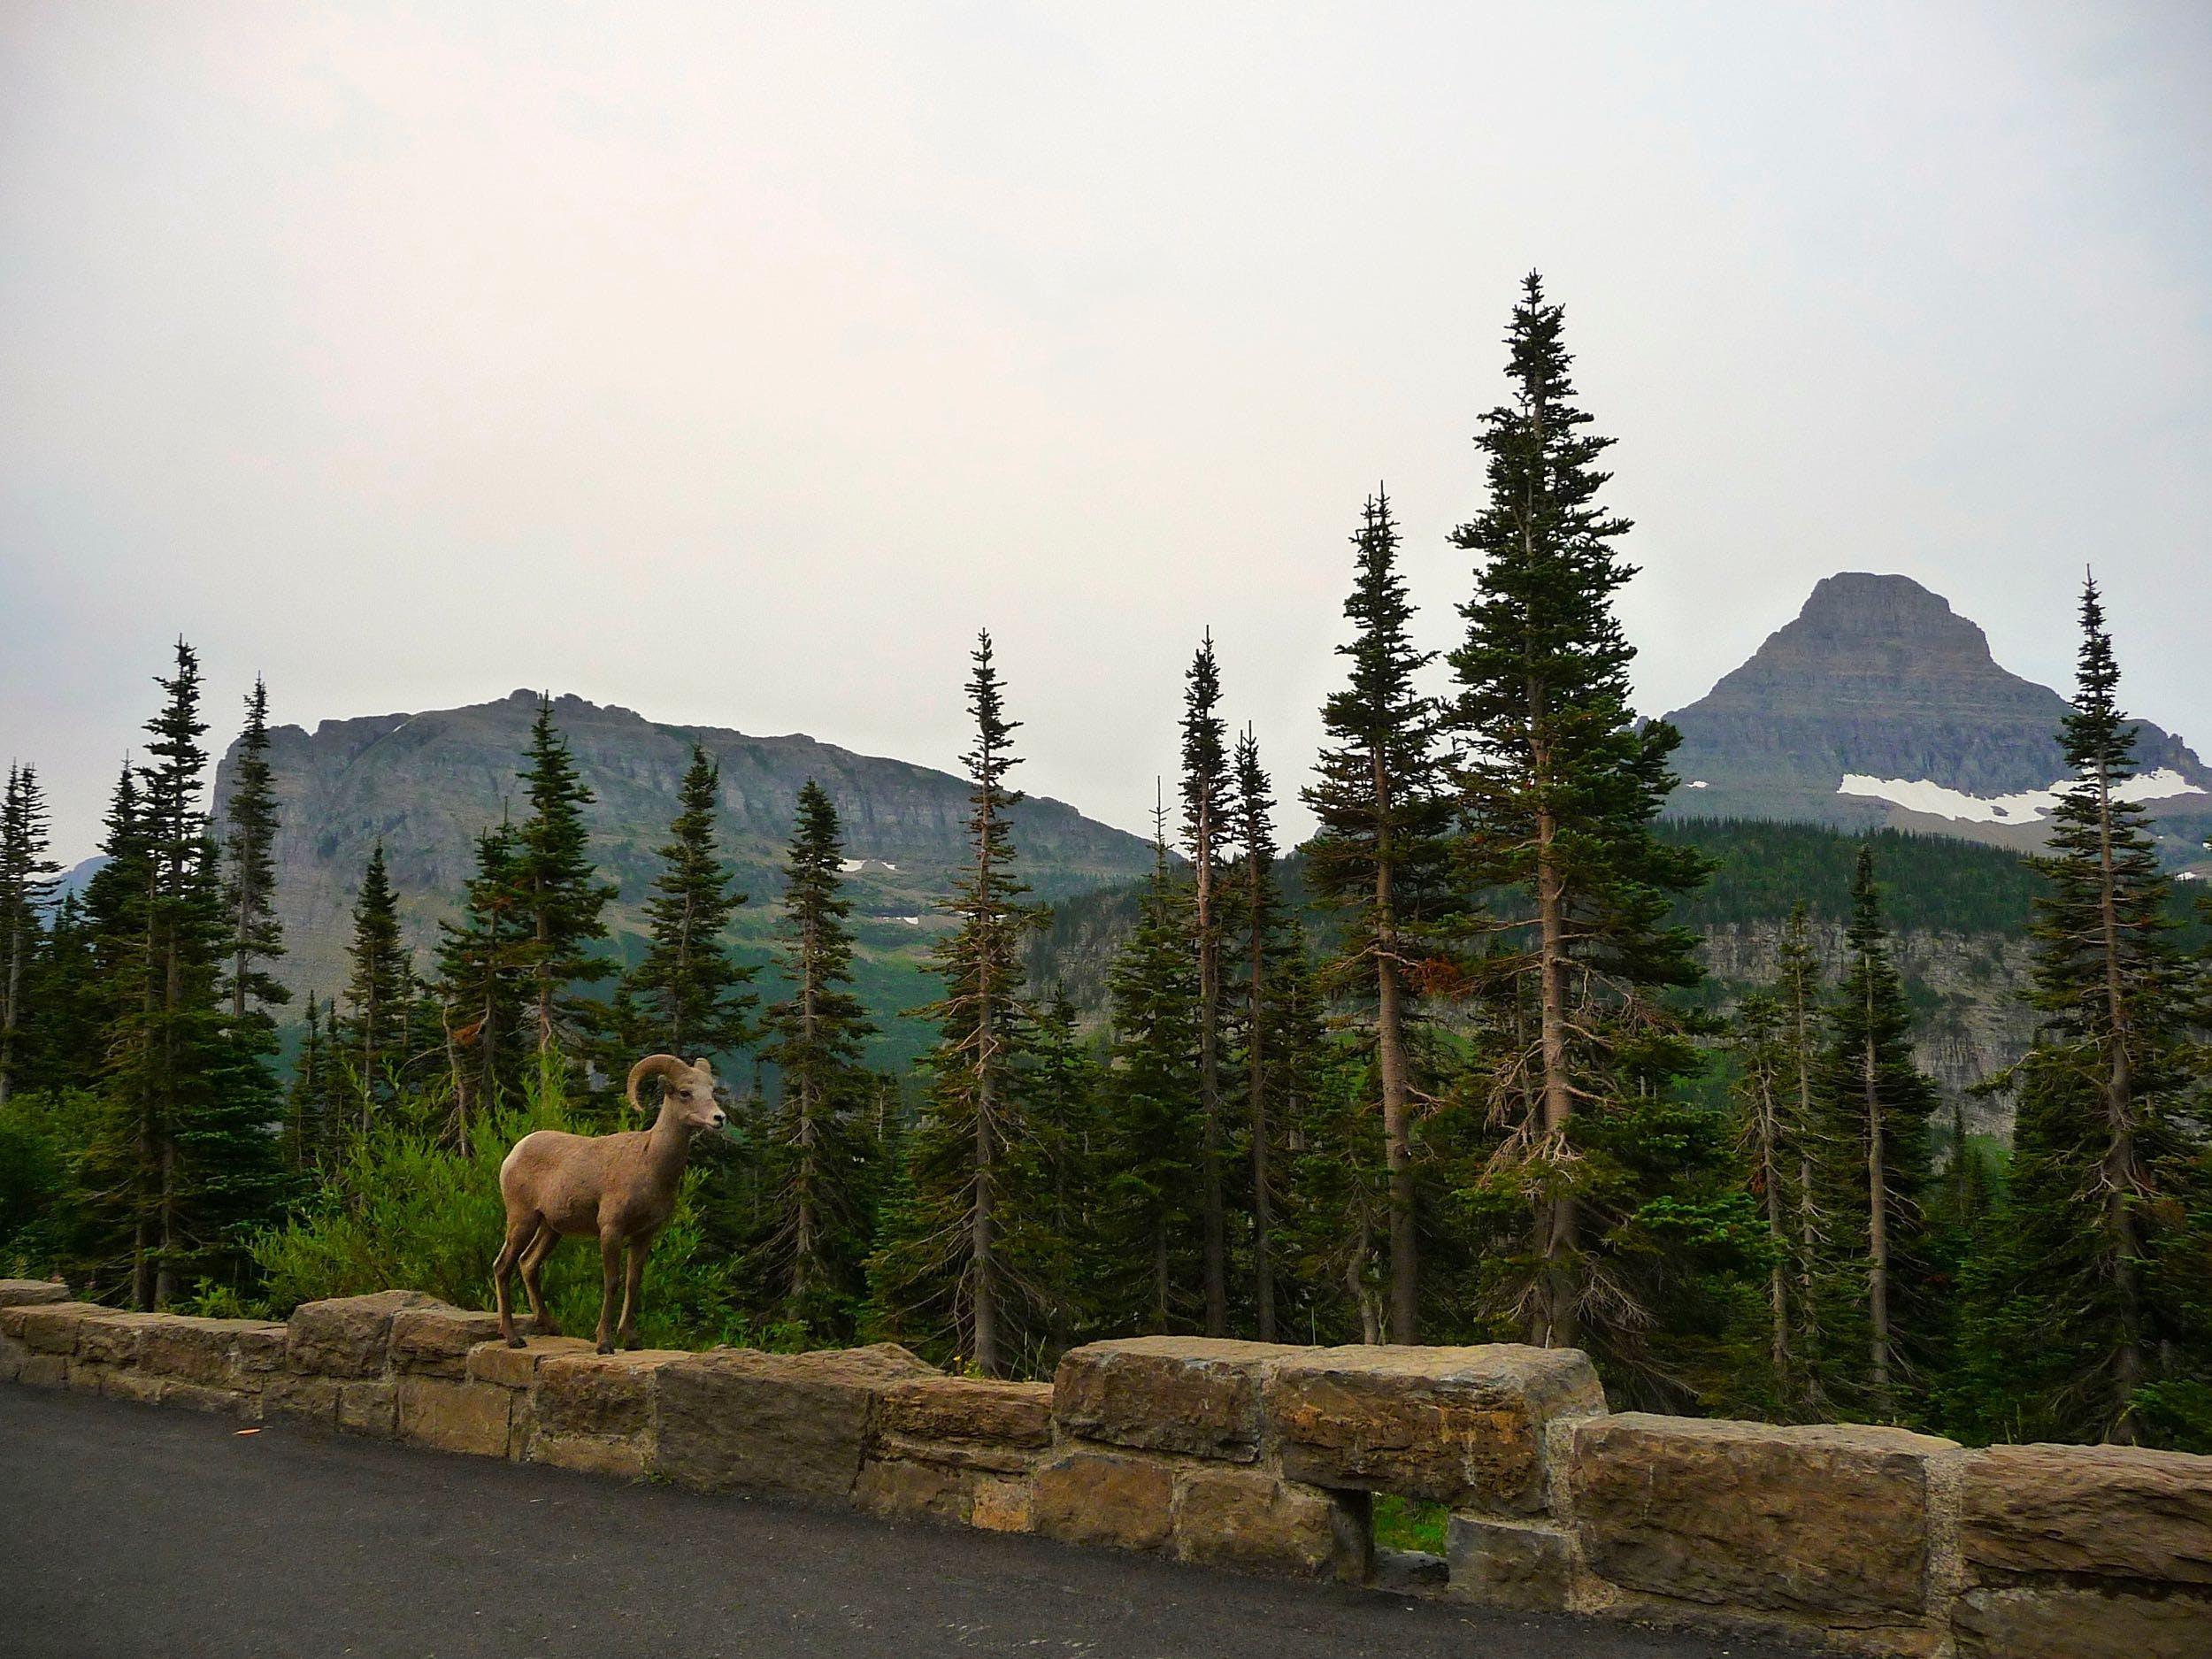 Kostenloses Stock Foto zu bäume, berge, mufflon, natur